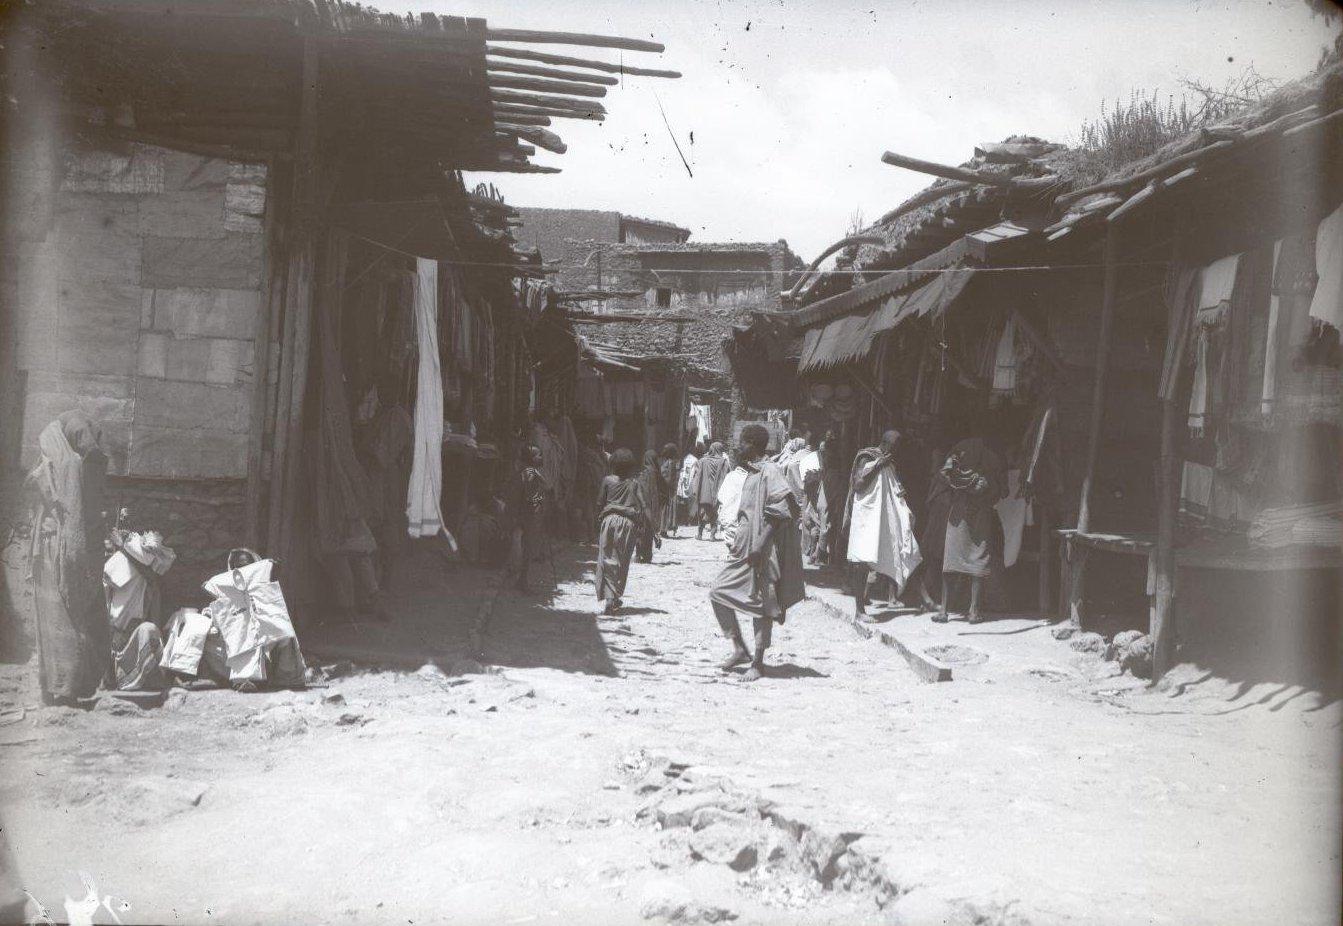 246. Абиссиния, провинция Харар, г. Харар. Базарная улица. Галла